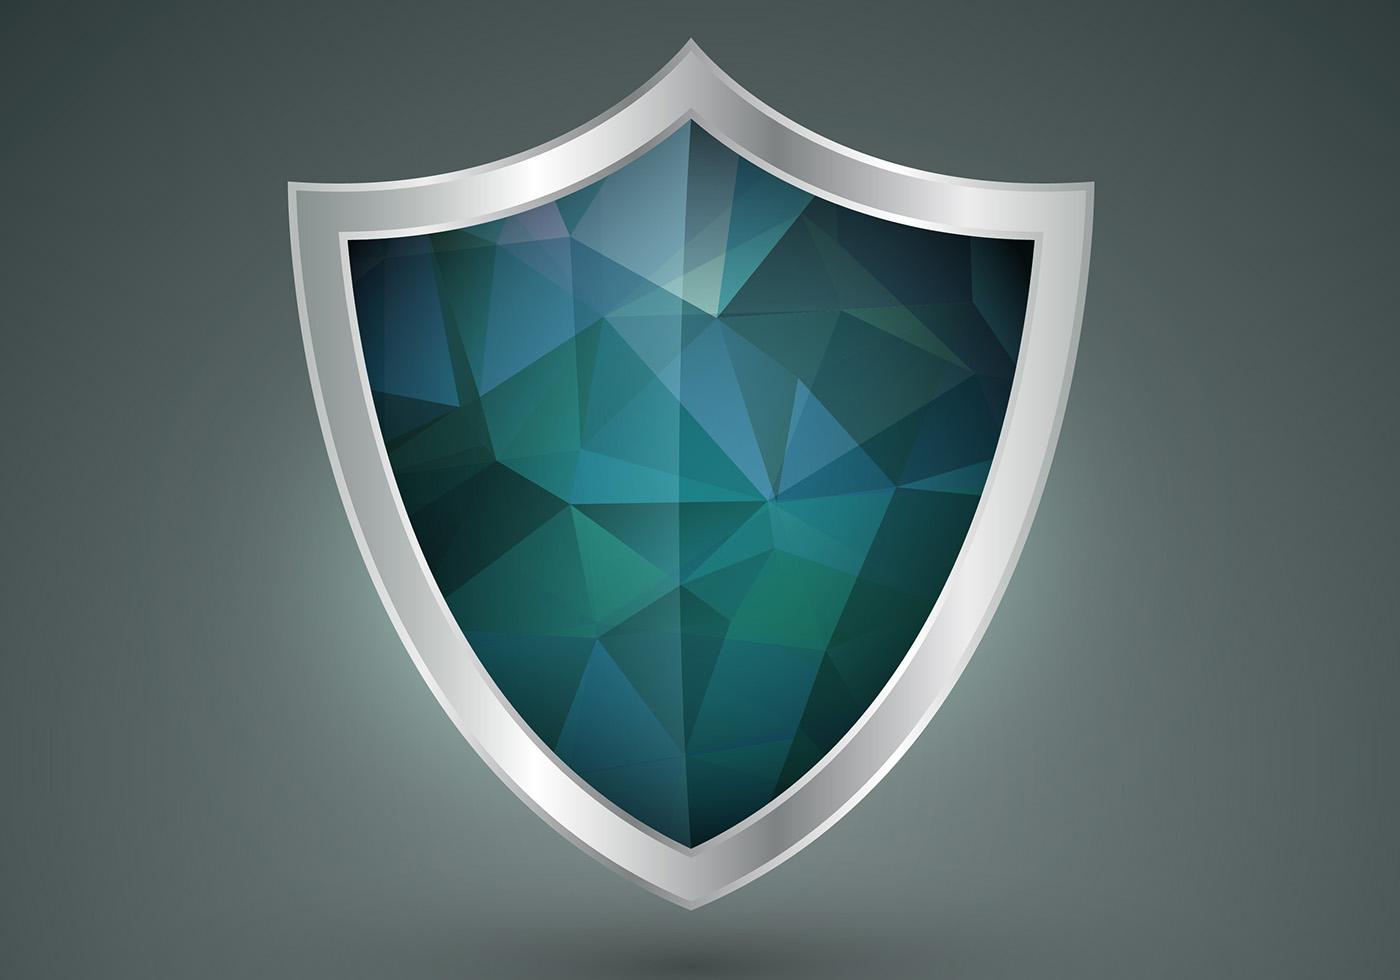 95266 Polygonal Shield Shape Vector on Www Printable Shapes